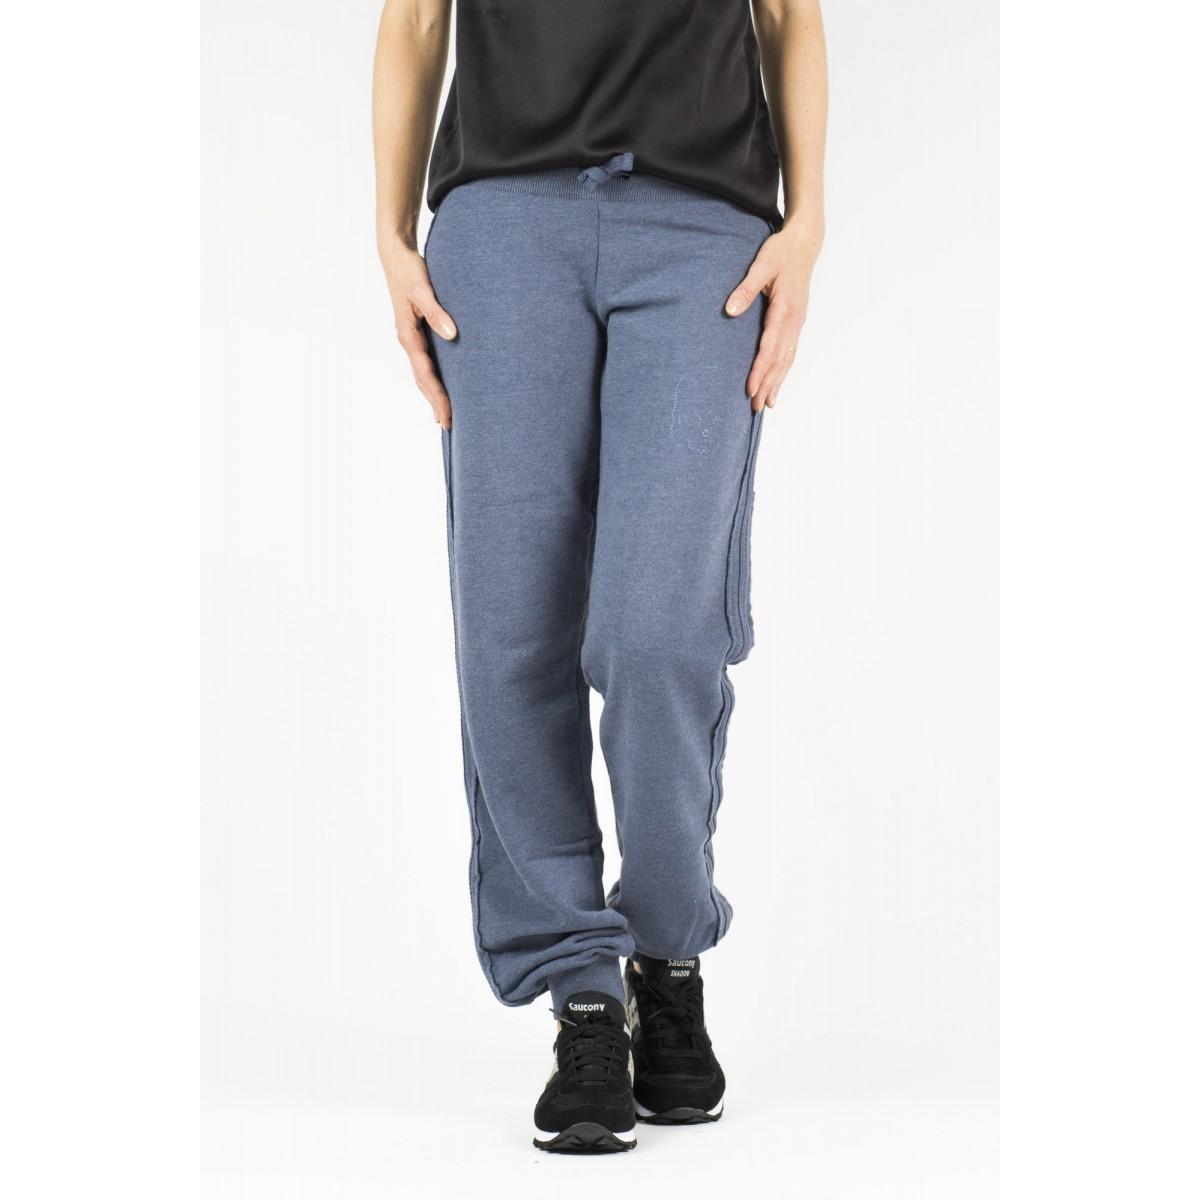 Pantalone Donna Hydrogen - 155004 Pantalone Tuta